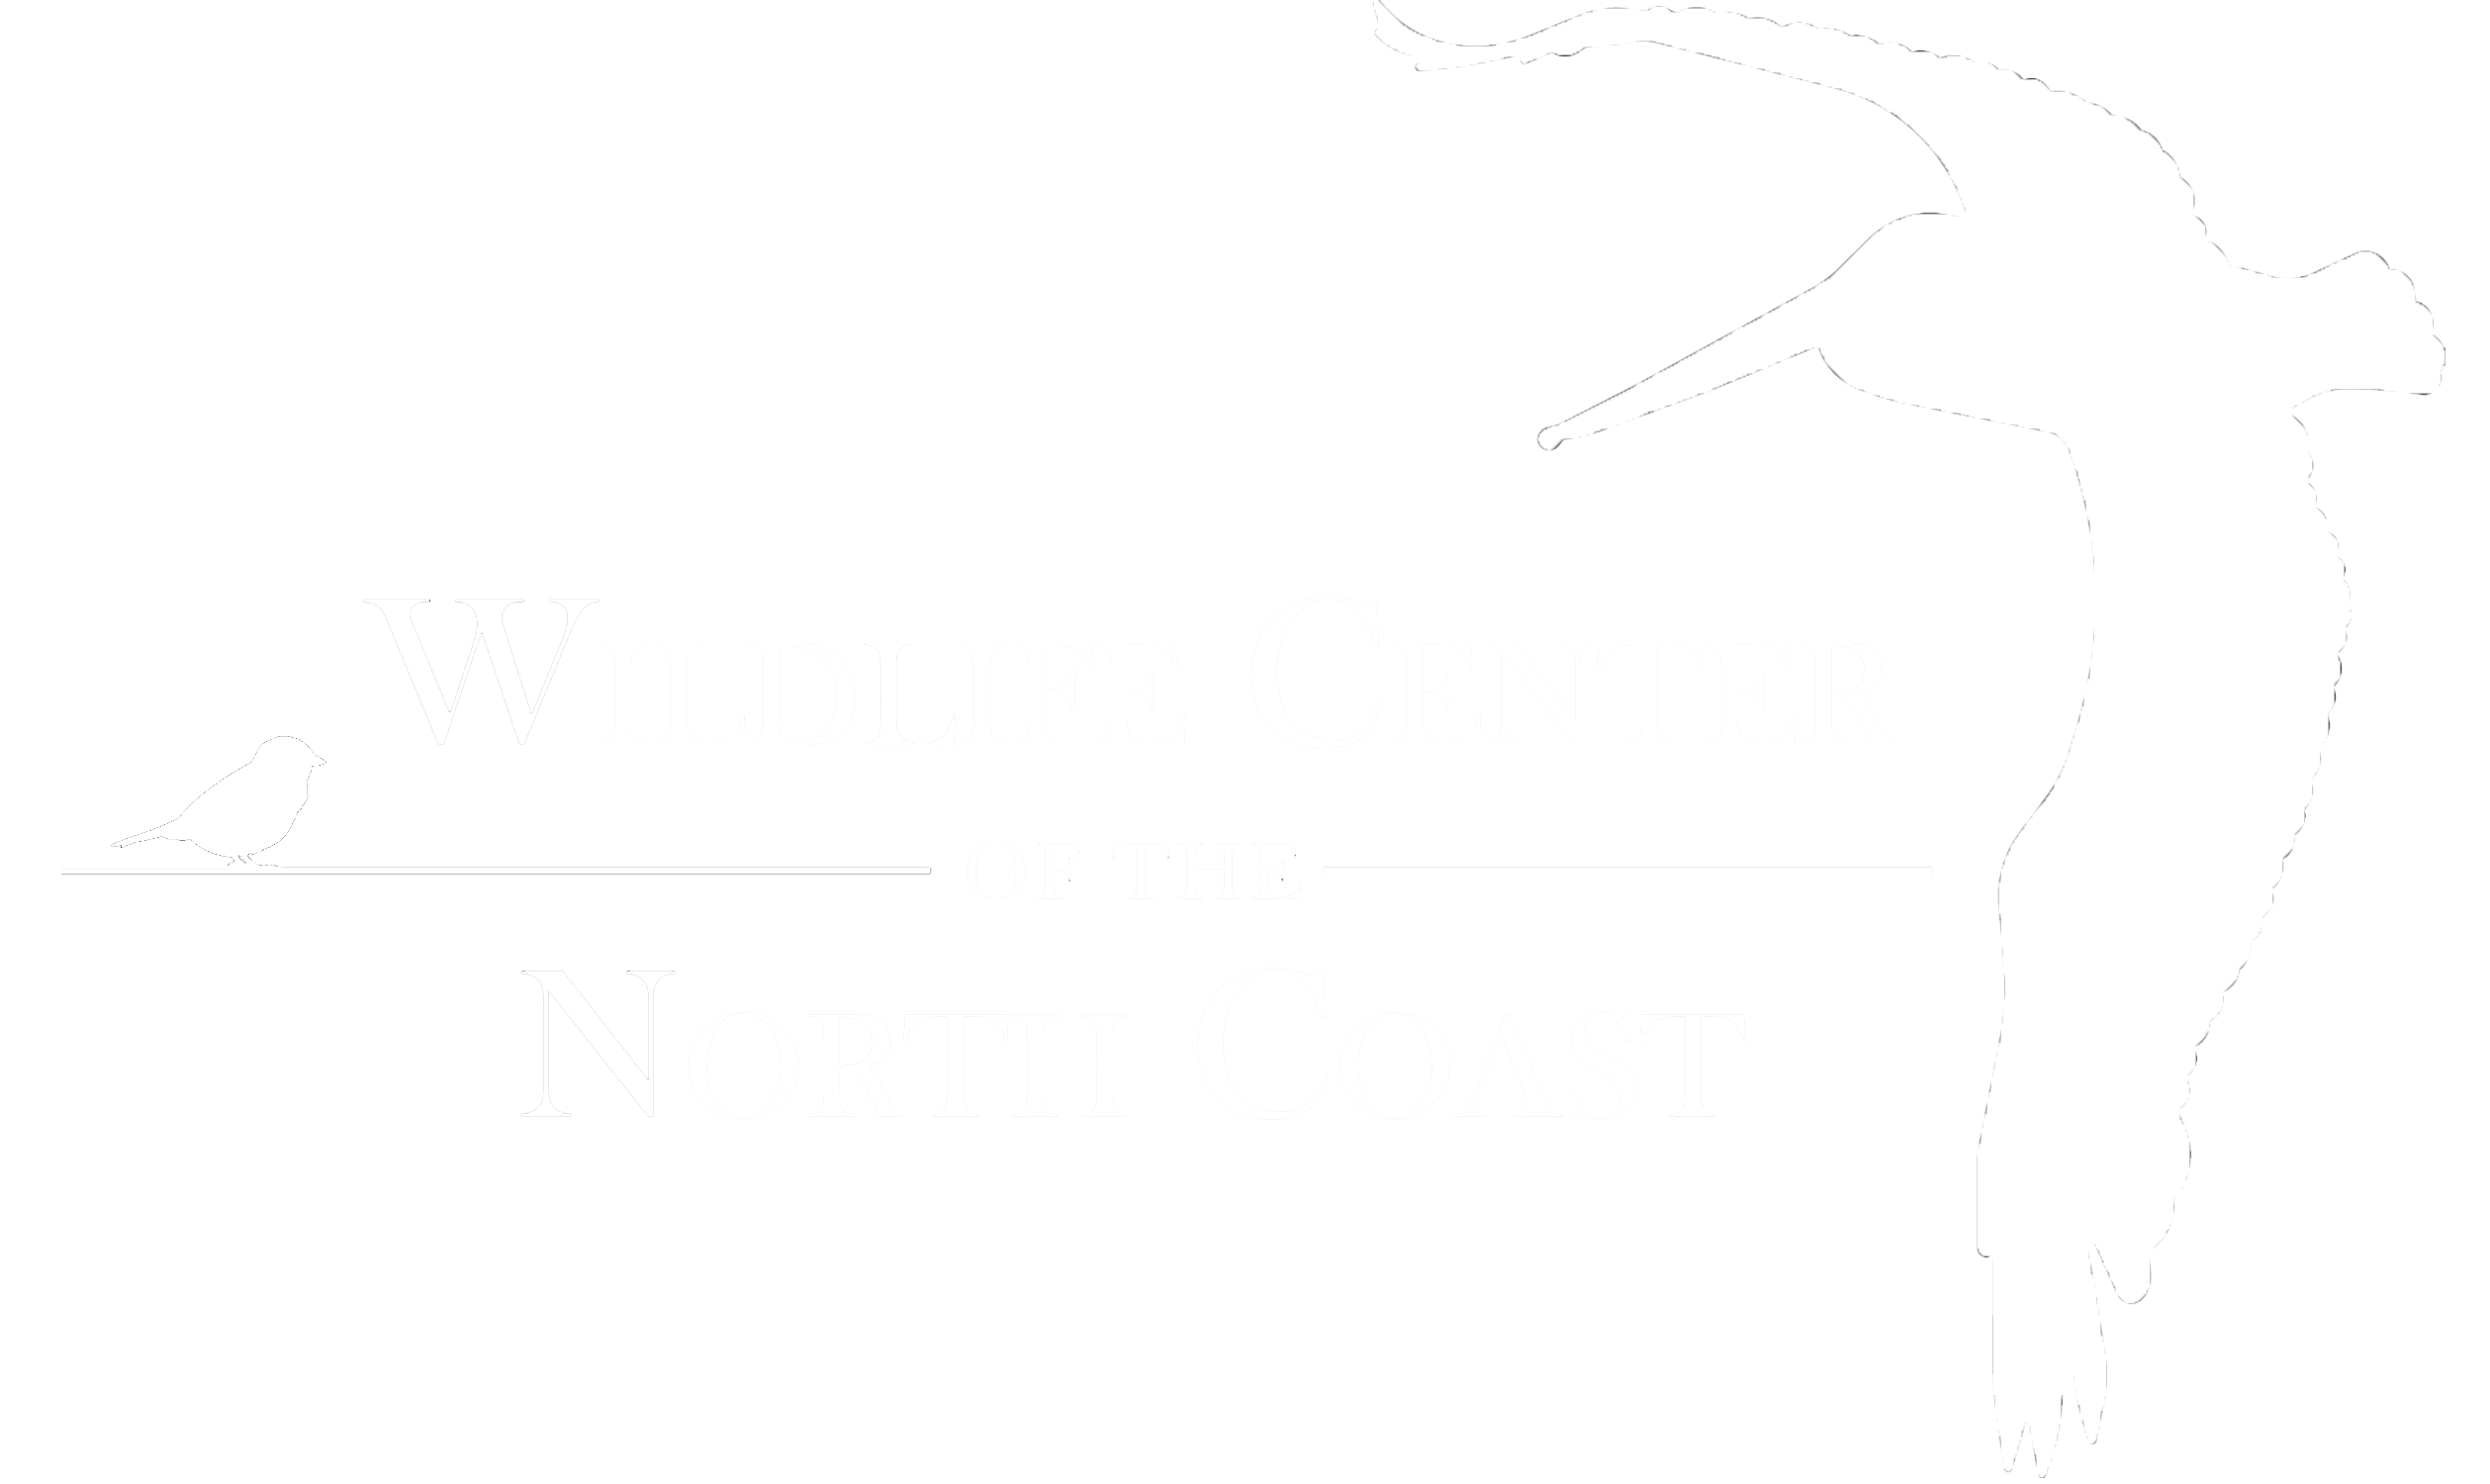 Wildlife Center of the North Coast